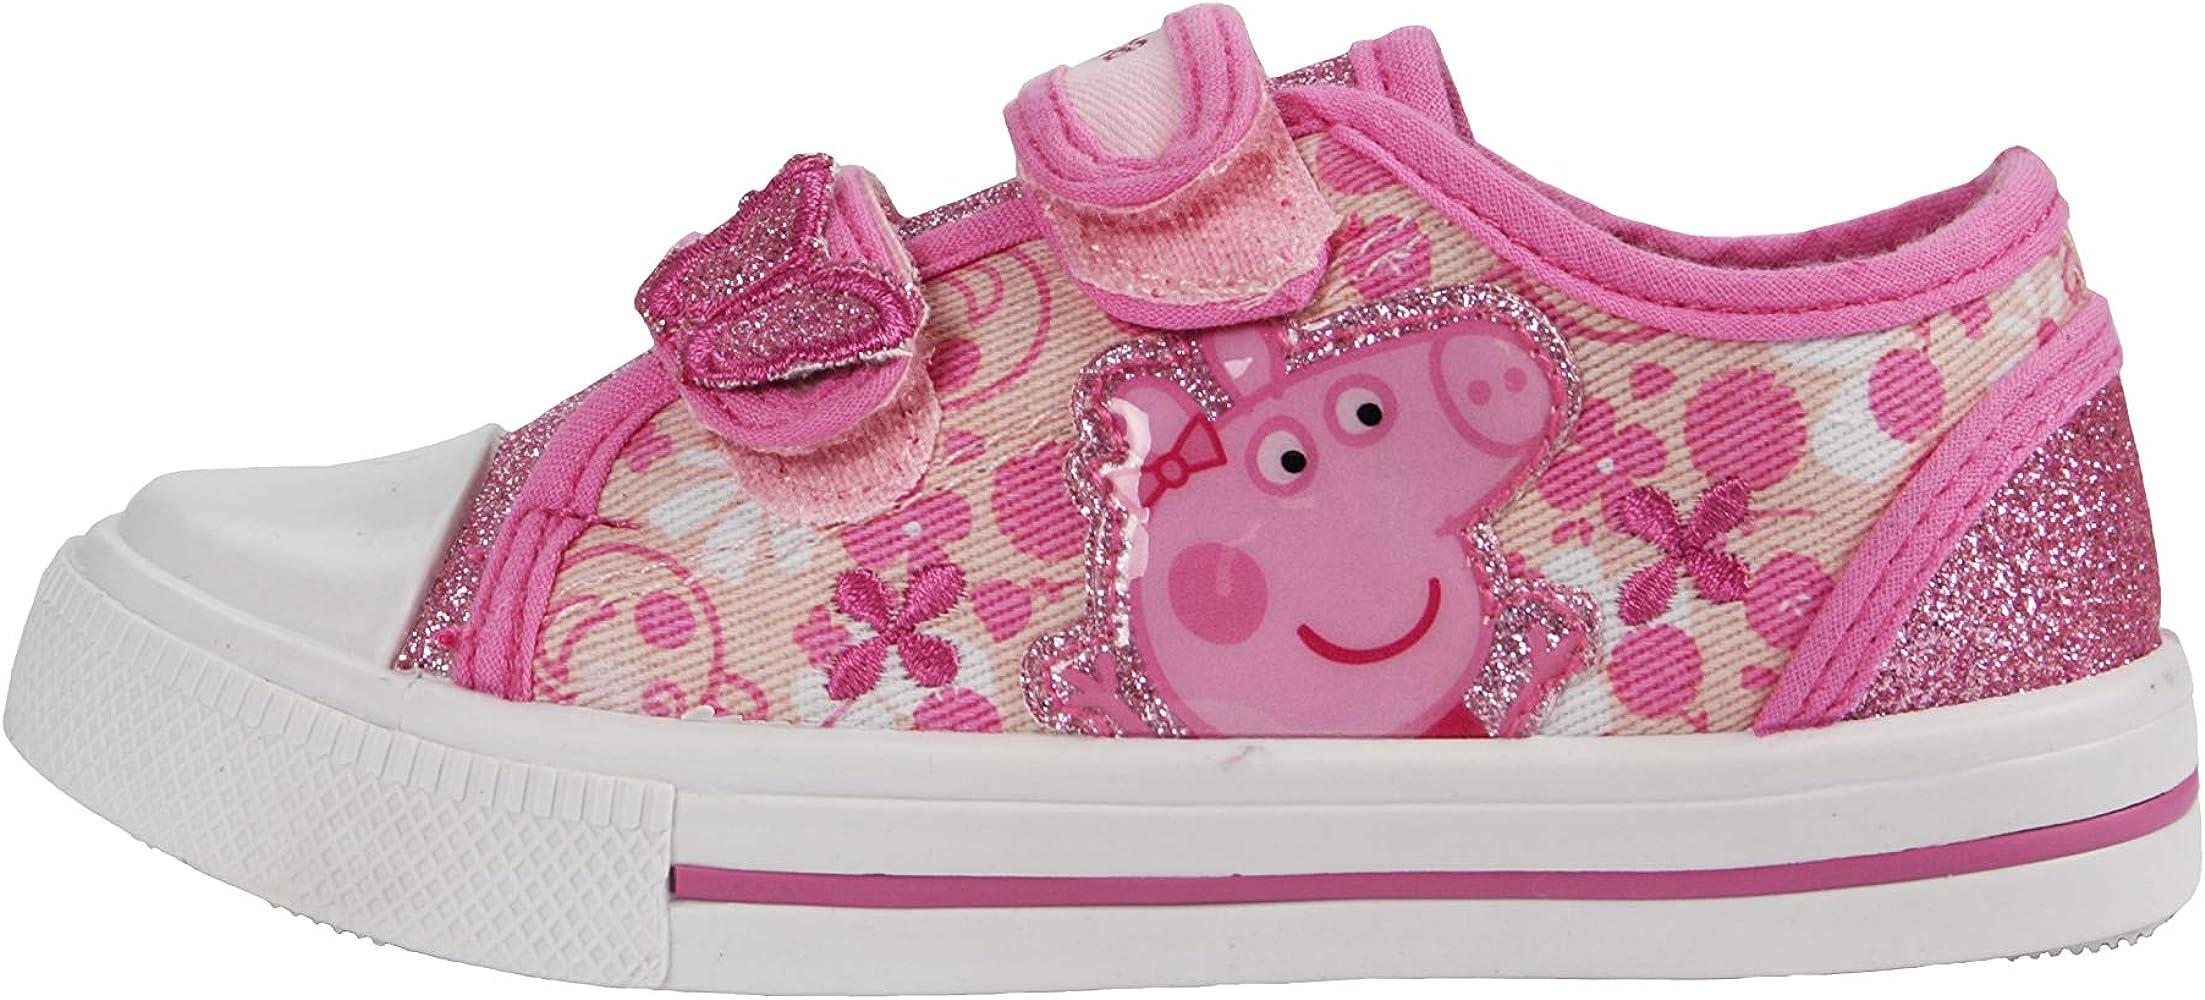 Girls Peppa Pig White/Pink Trainers UK